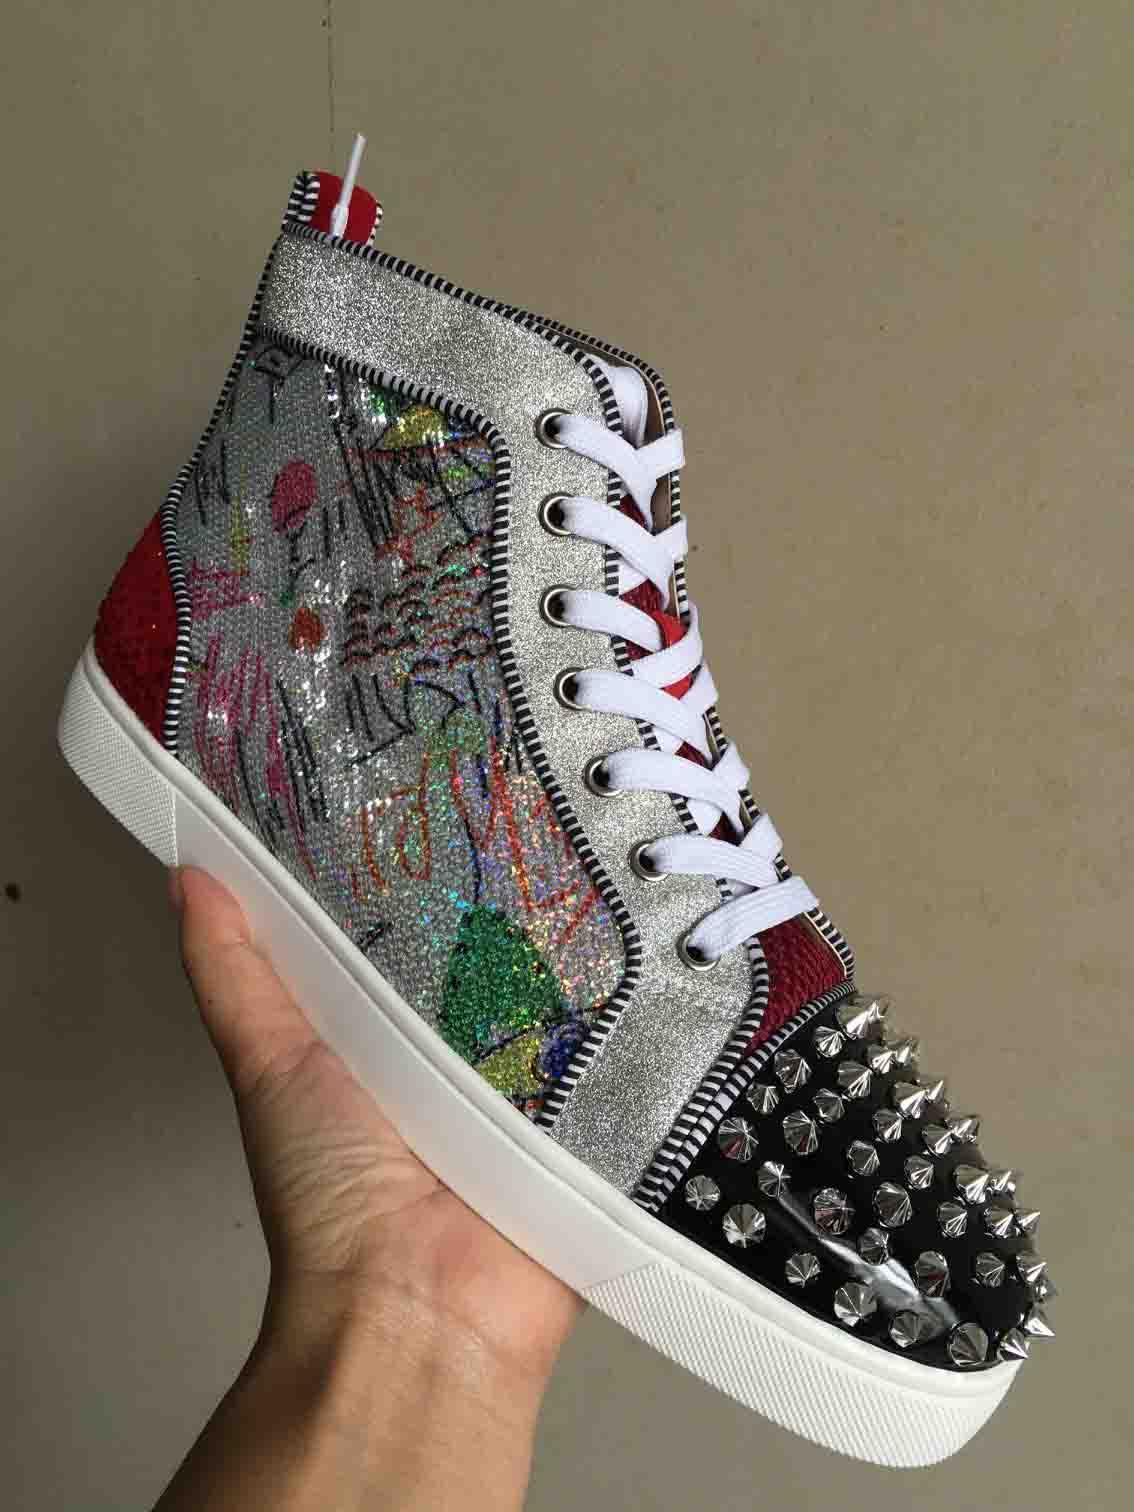 2019 High Top Red Bottom Spikes Sneakers Hommes Casual Chaussures De Luxe Imprimé Argent Sequin Sliver Pik No Limit Plots RARES et strass Graffiti